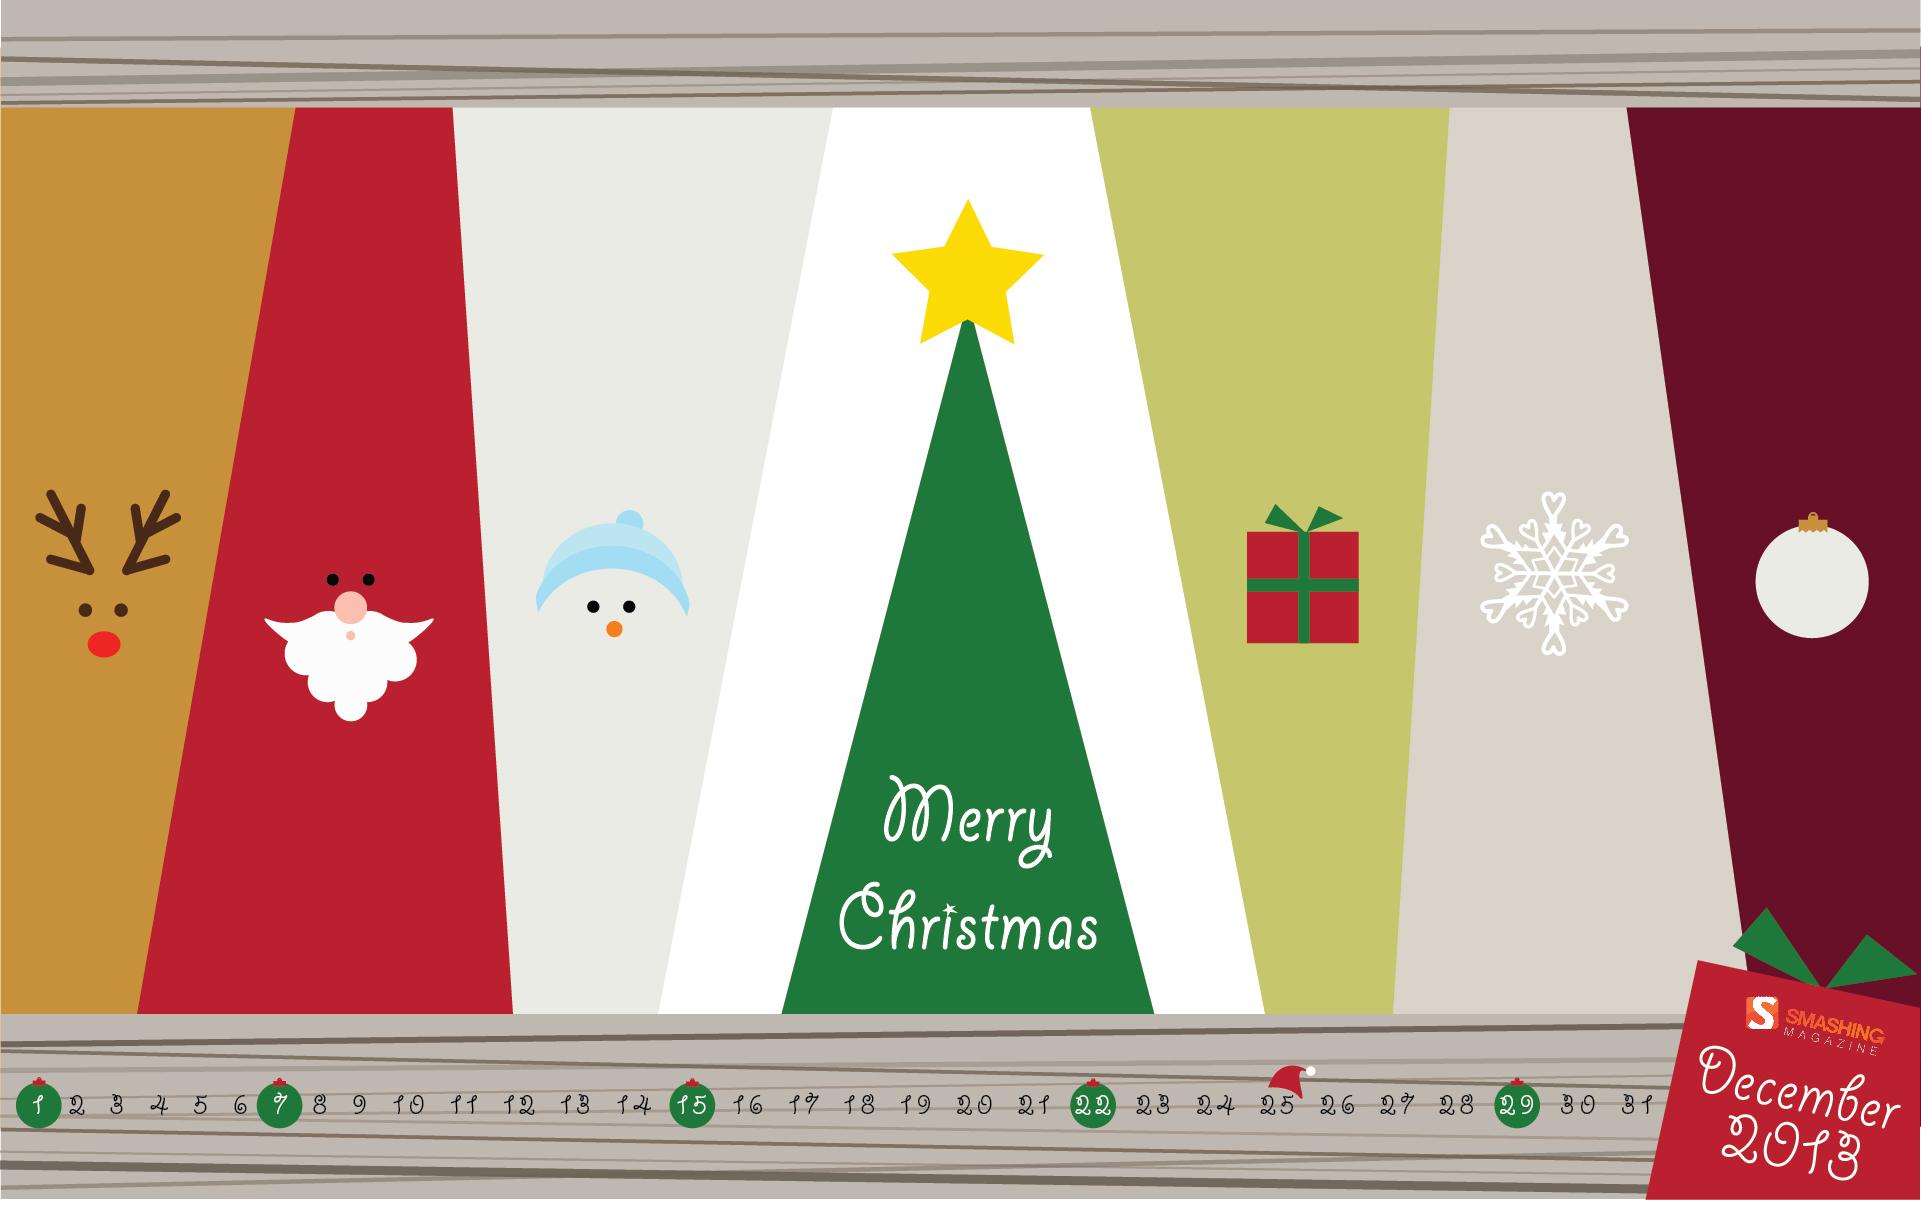 dec-13-minimalist-christmas-cal-1920x1200